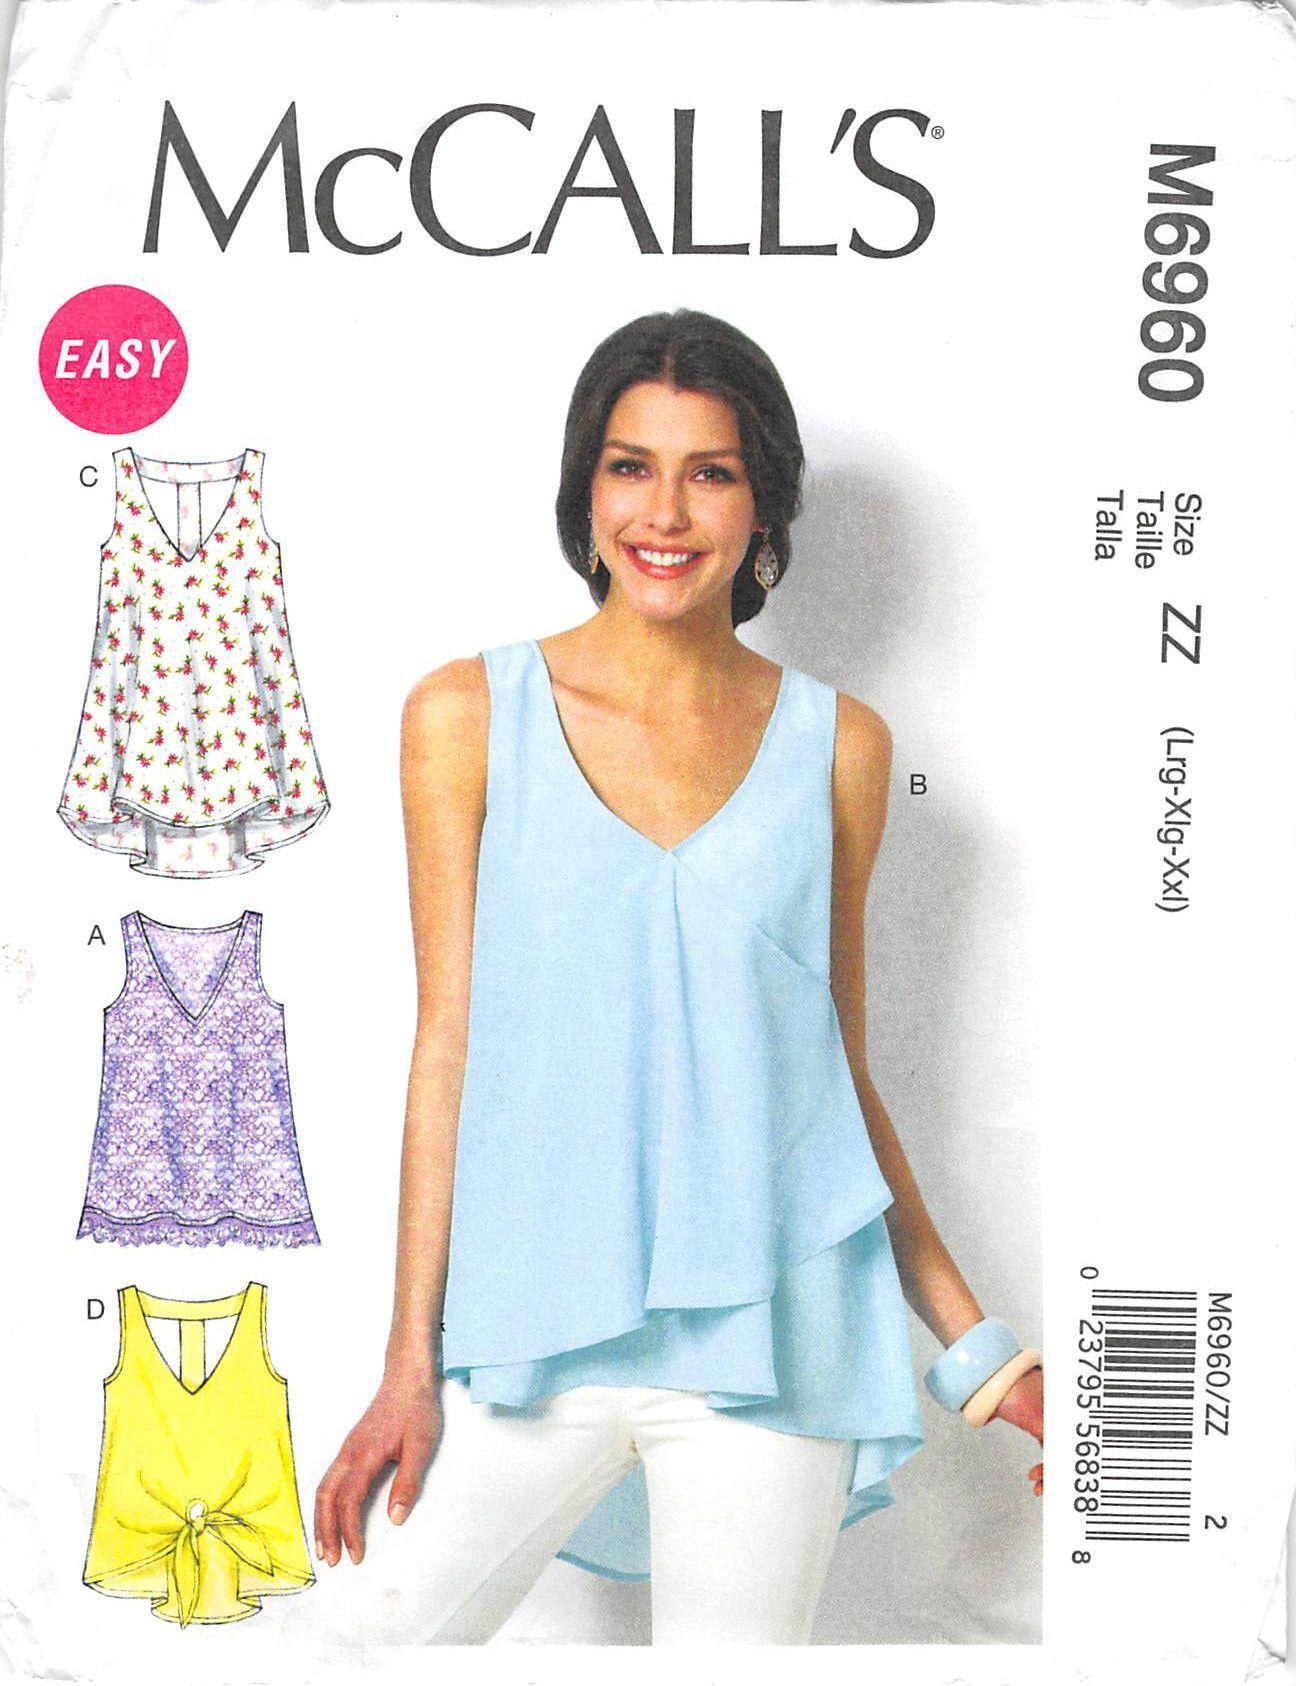 Mccalls 6960 - from 2014 - uncut - misses tops & tunics | Blusas y ...